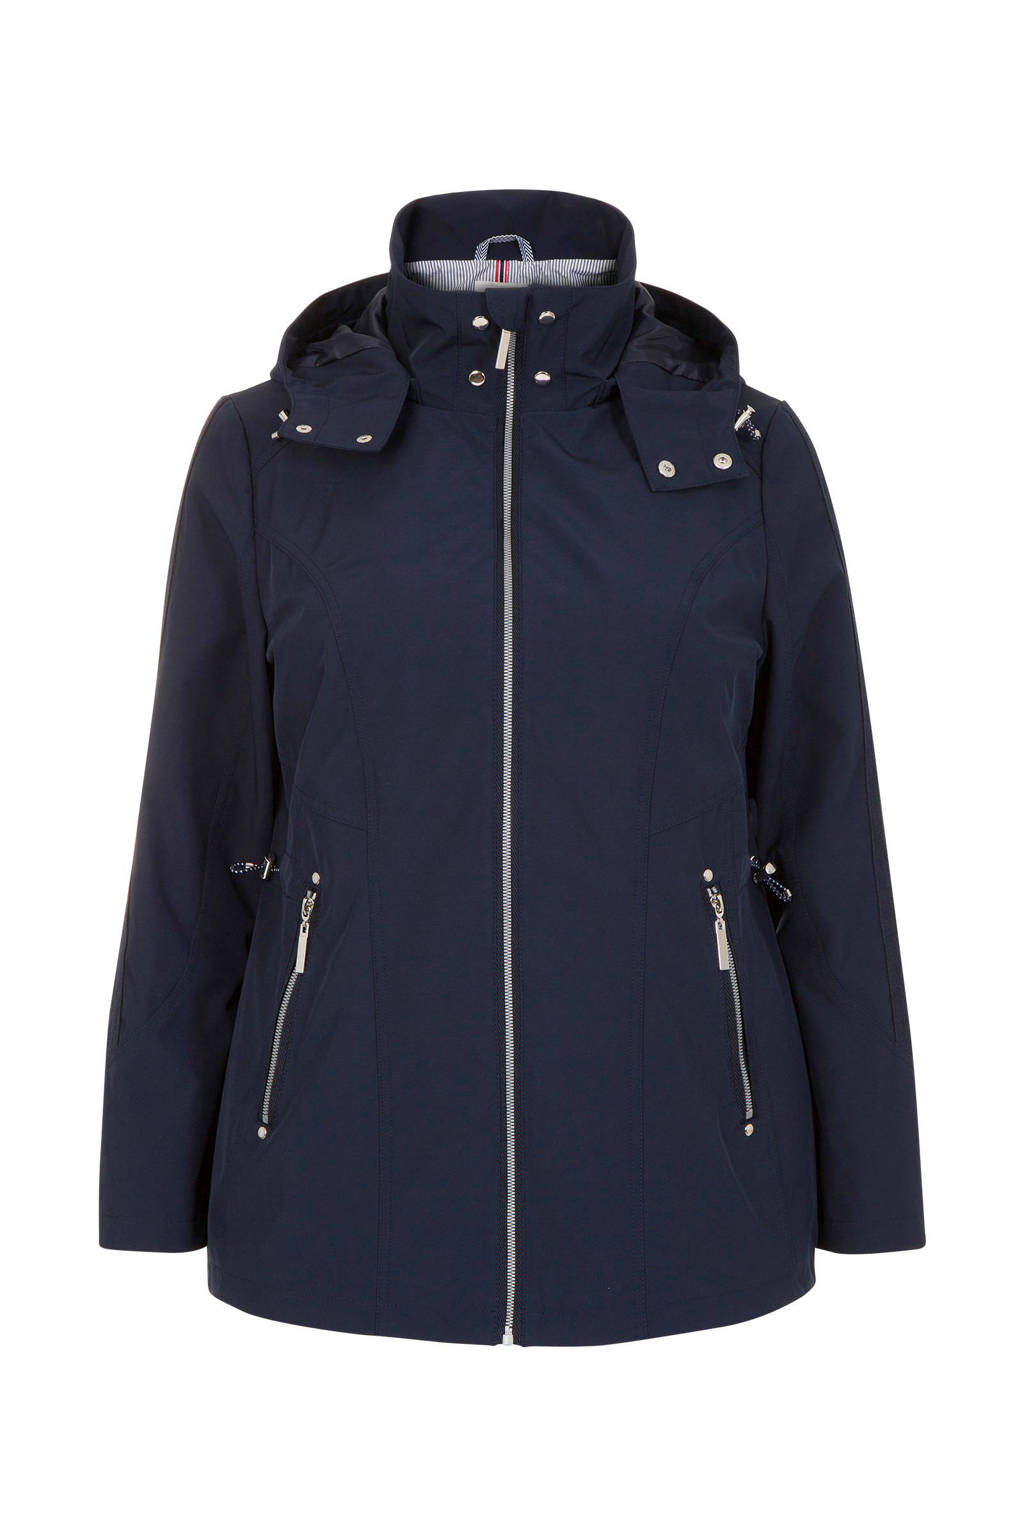 Miss Etam Plus jas donkerblauw, Blauw